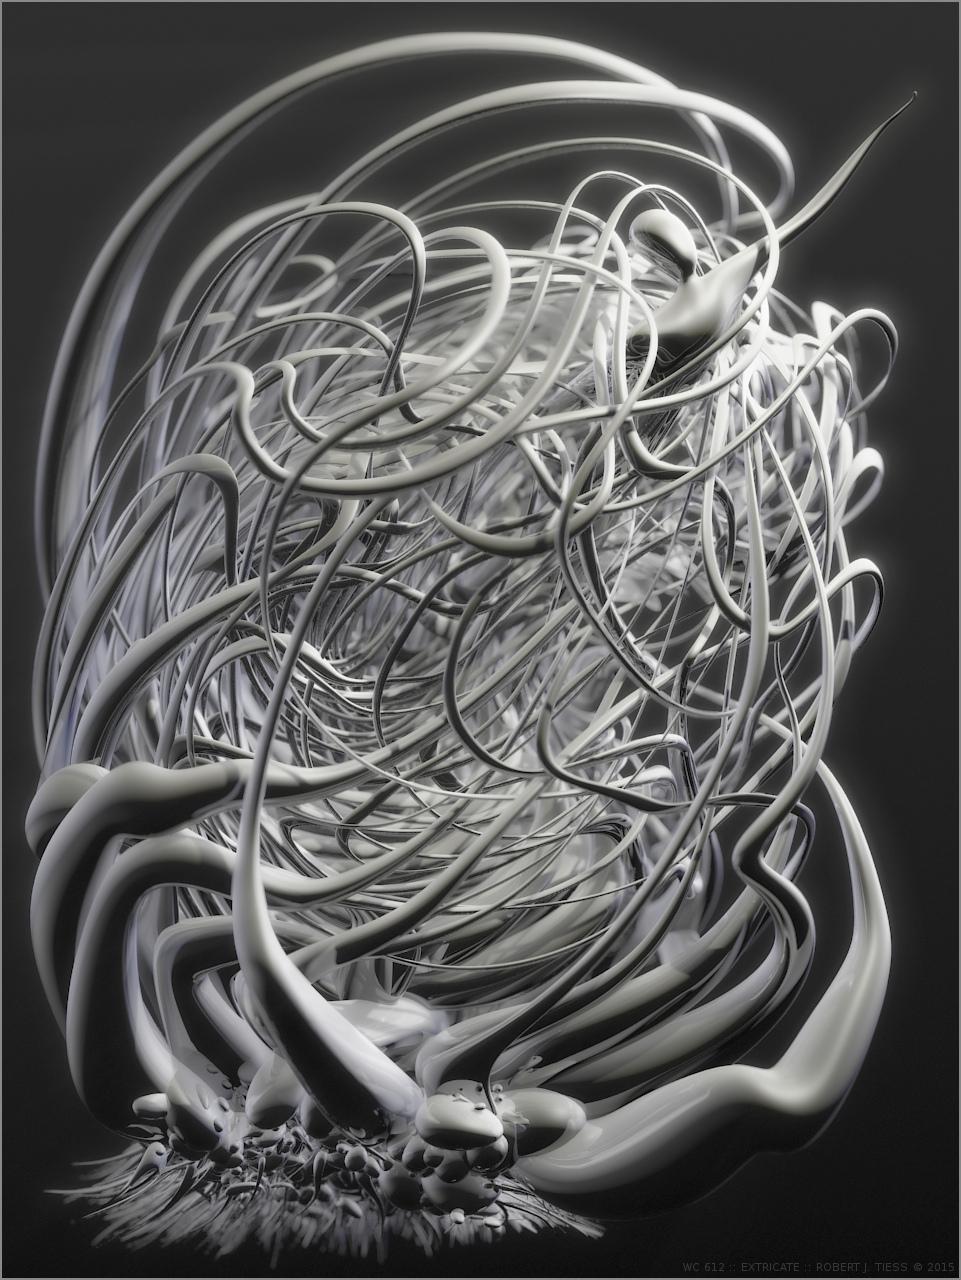 Extricate - By Robert J. Tiess